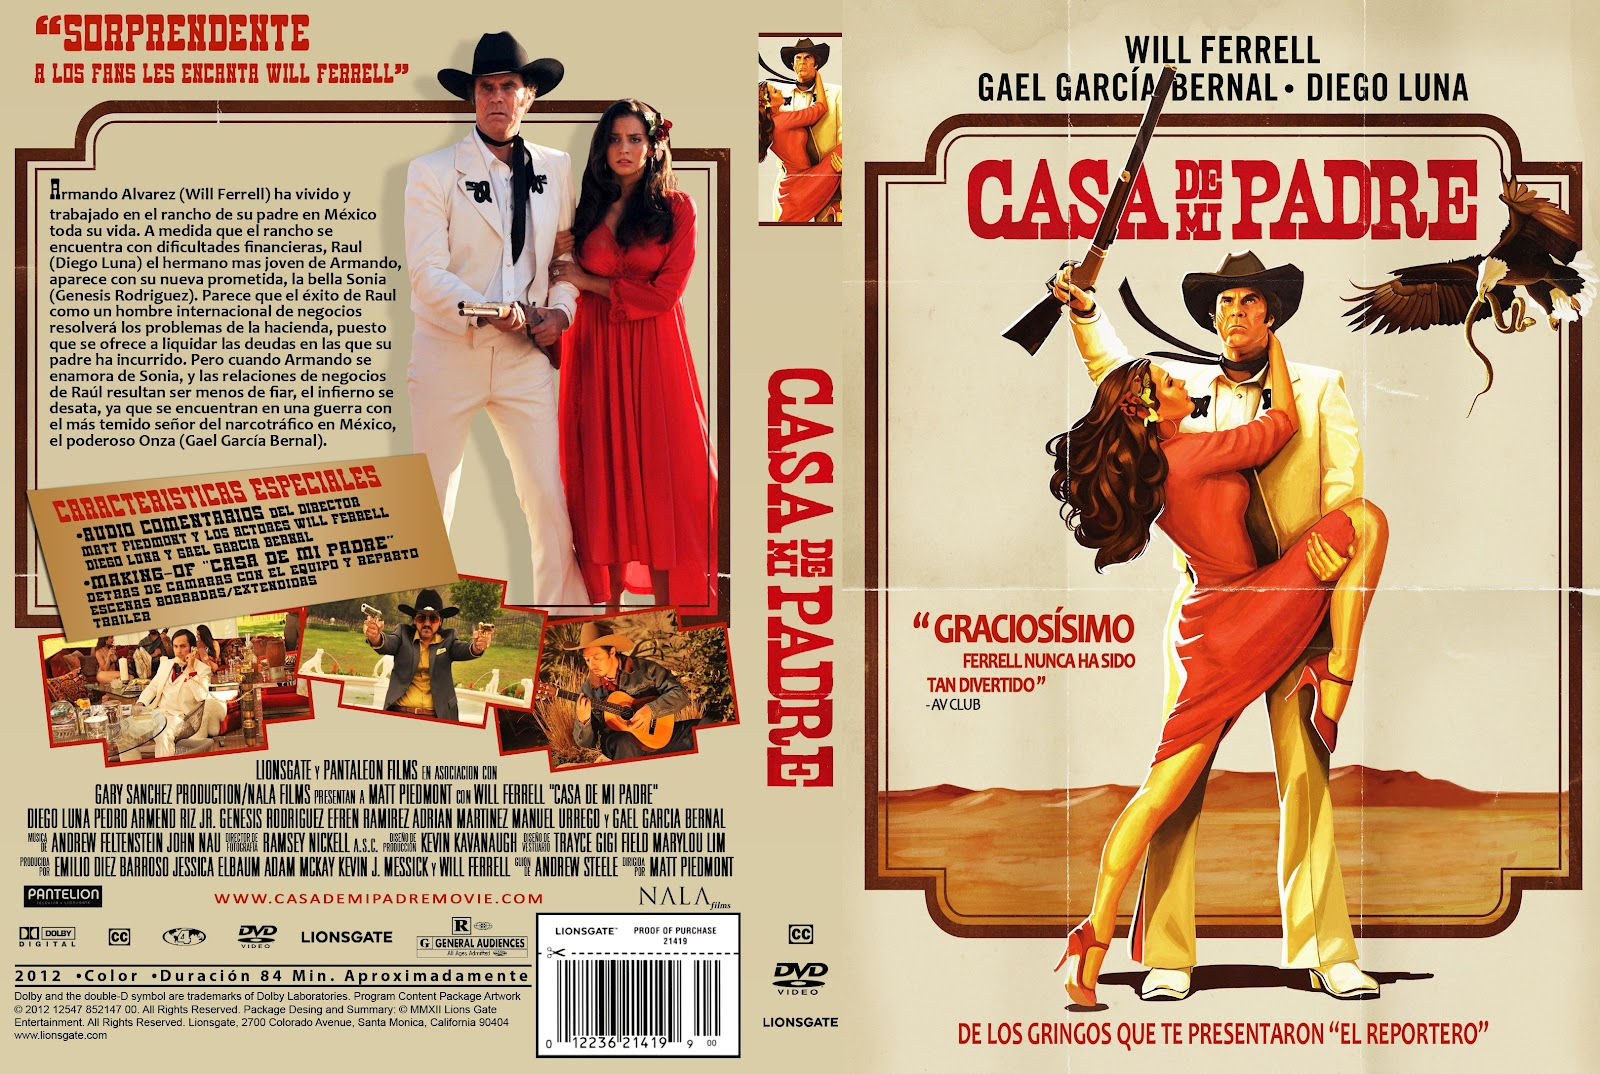 http://2.bp.blogspot.com/-glkK1sCcoEk/T_MikXqwRGI/AAAAAAAACRE/Gn43PlU_53k/s1600/Casa_De_Mi_Padre_-_Custom_-_V2_por_sorete22_%5Bdvd%5D_80.jpg